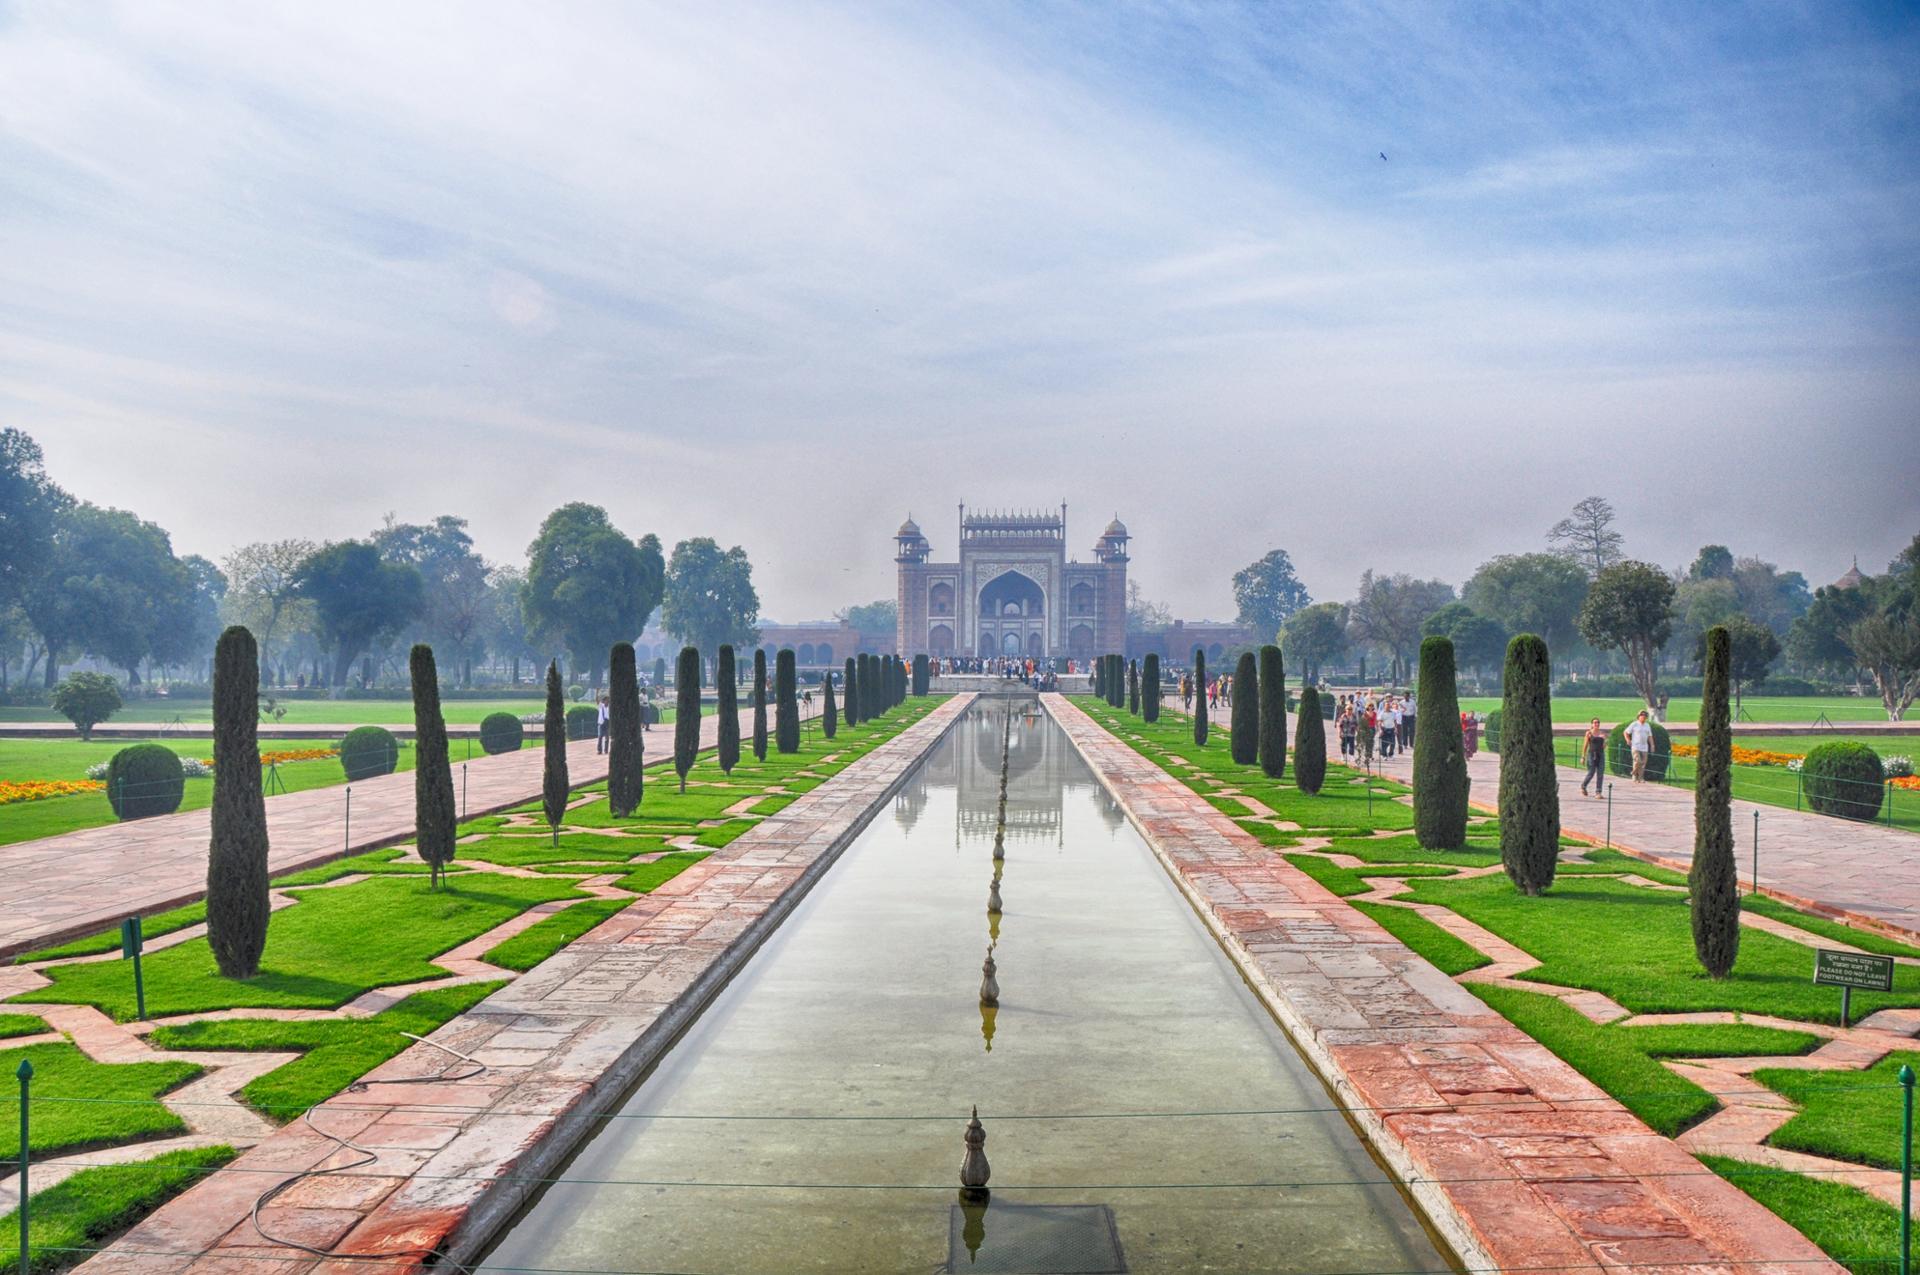 Géométrie végétale (Taj Mahal, Inde)